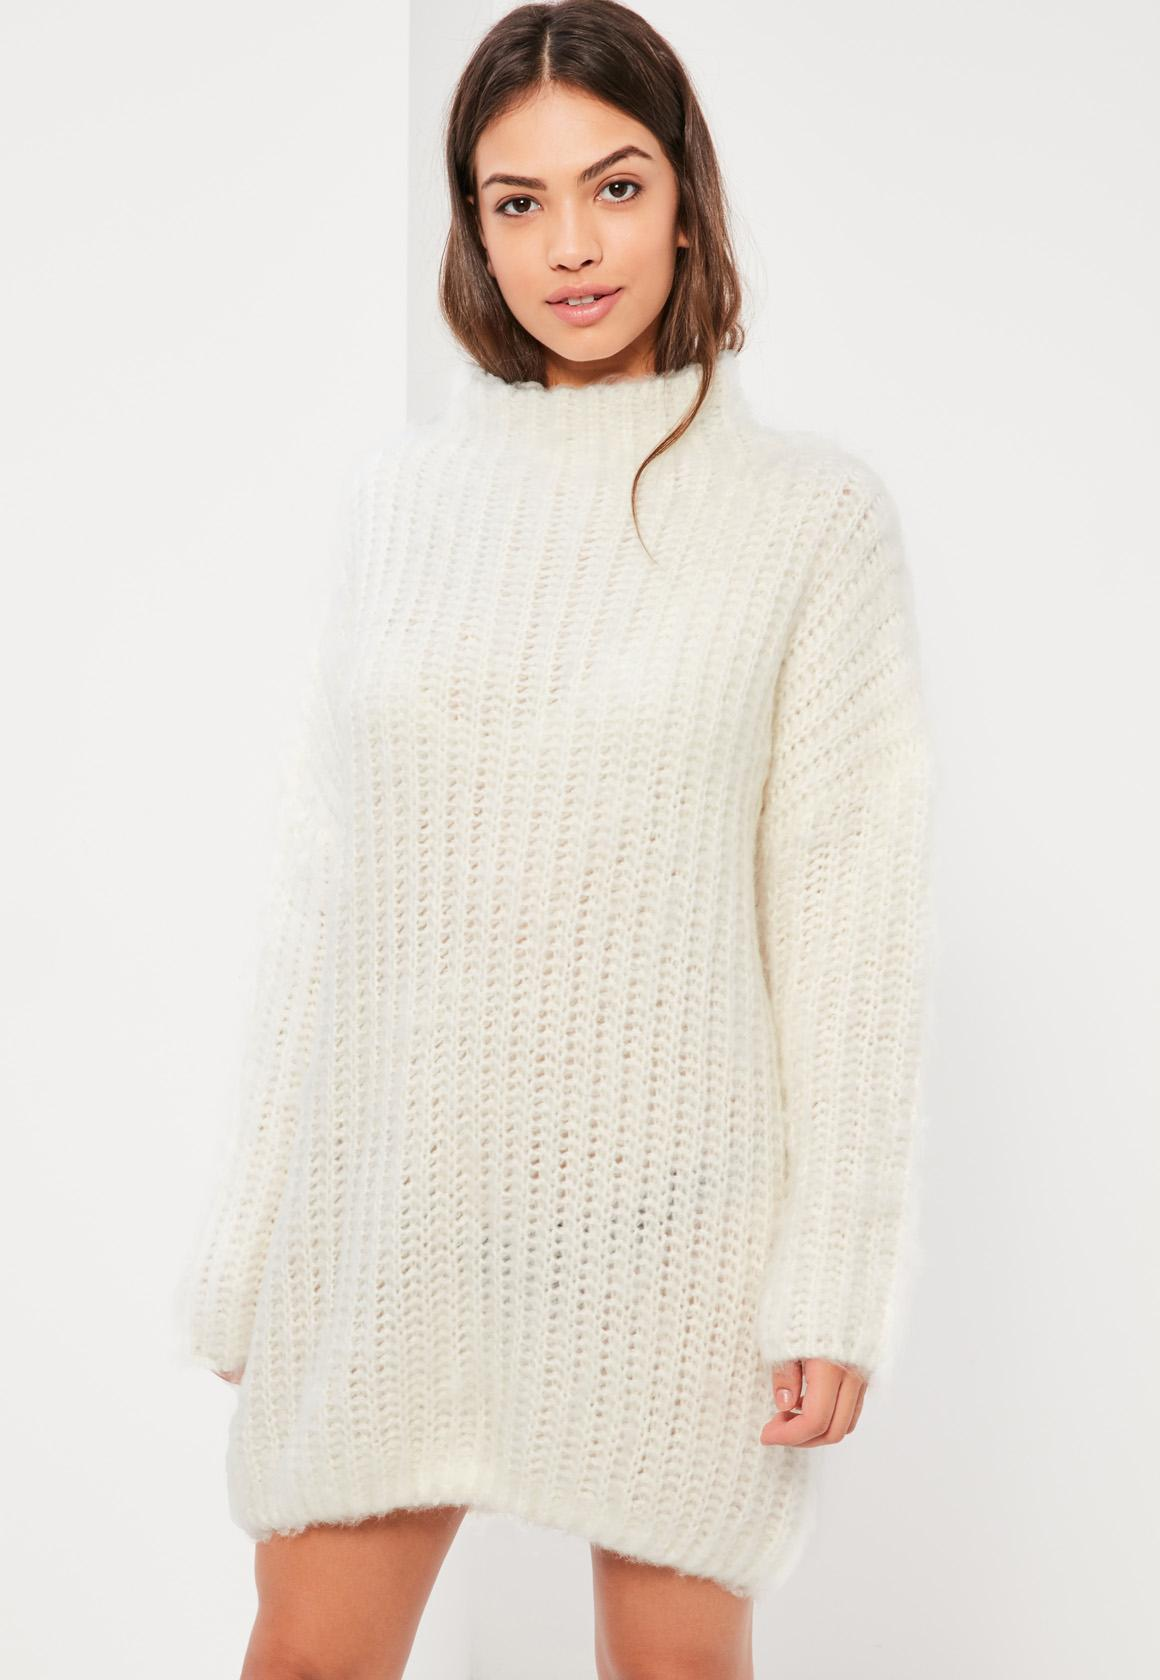 Cream Brushed Chunky Stitch Sweater Dress | Missguided